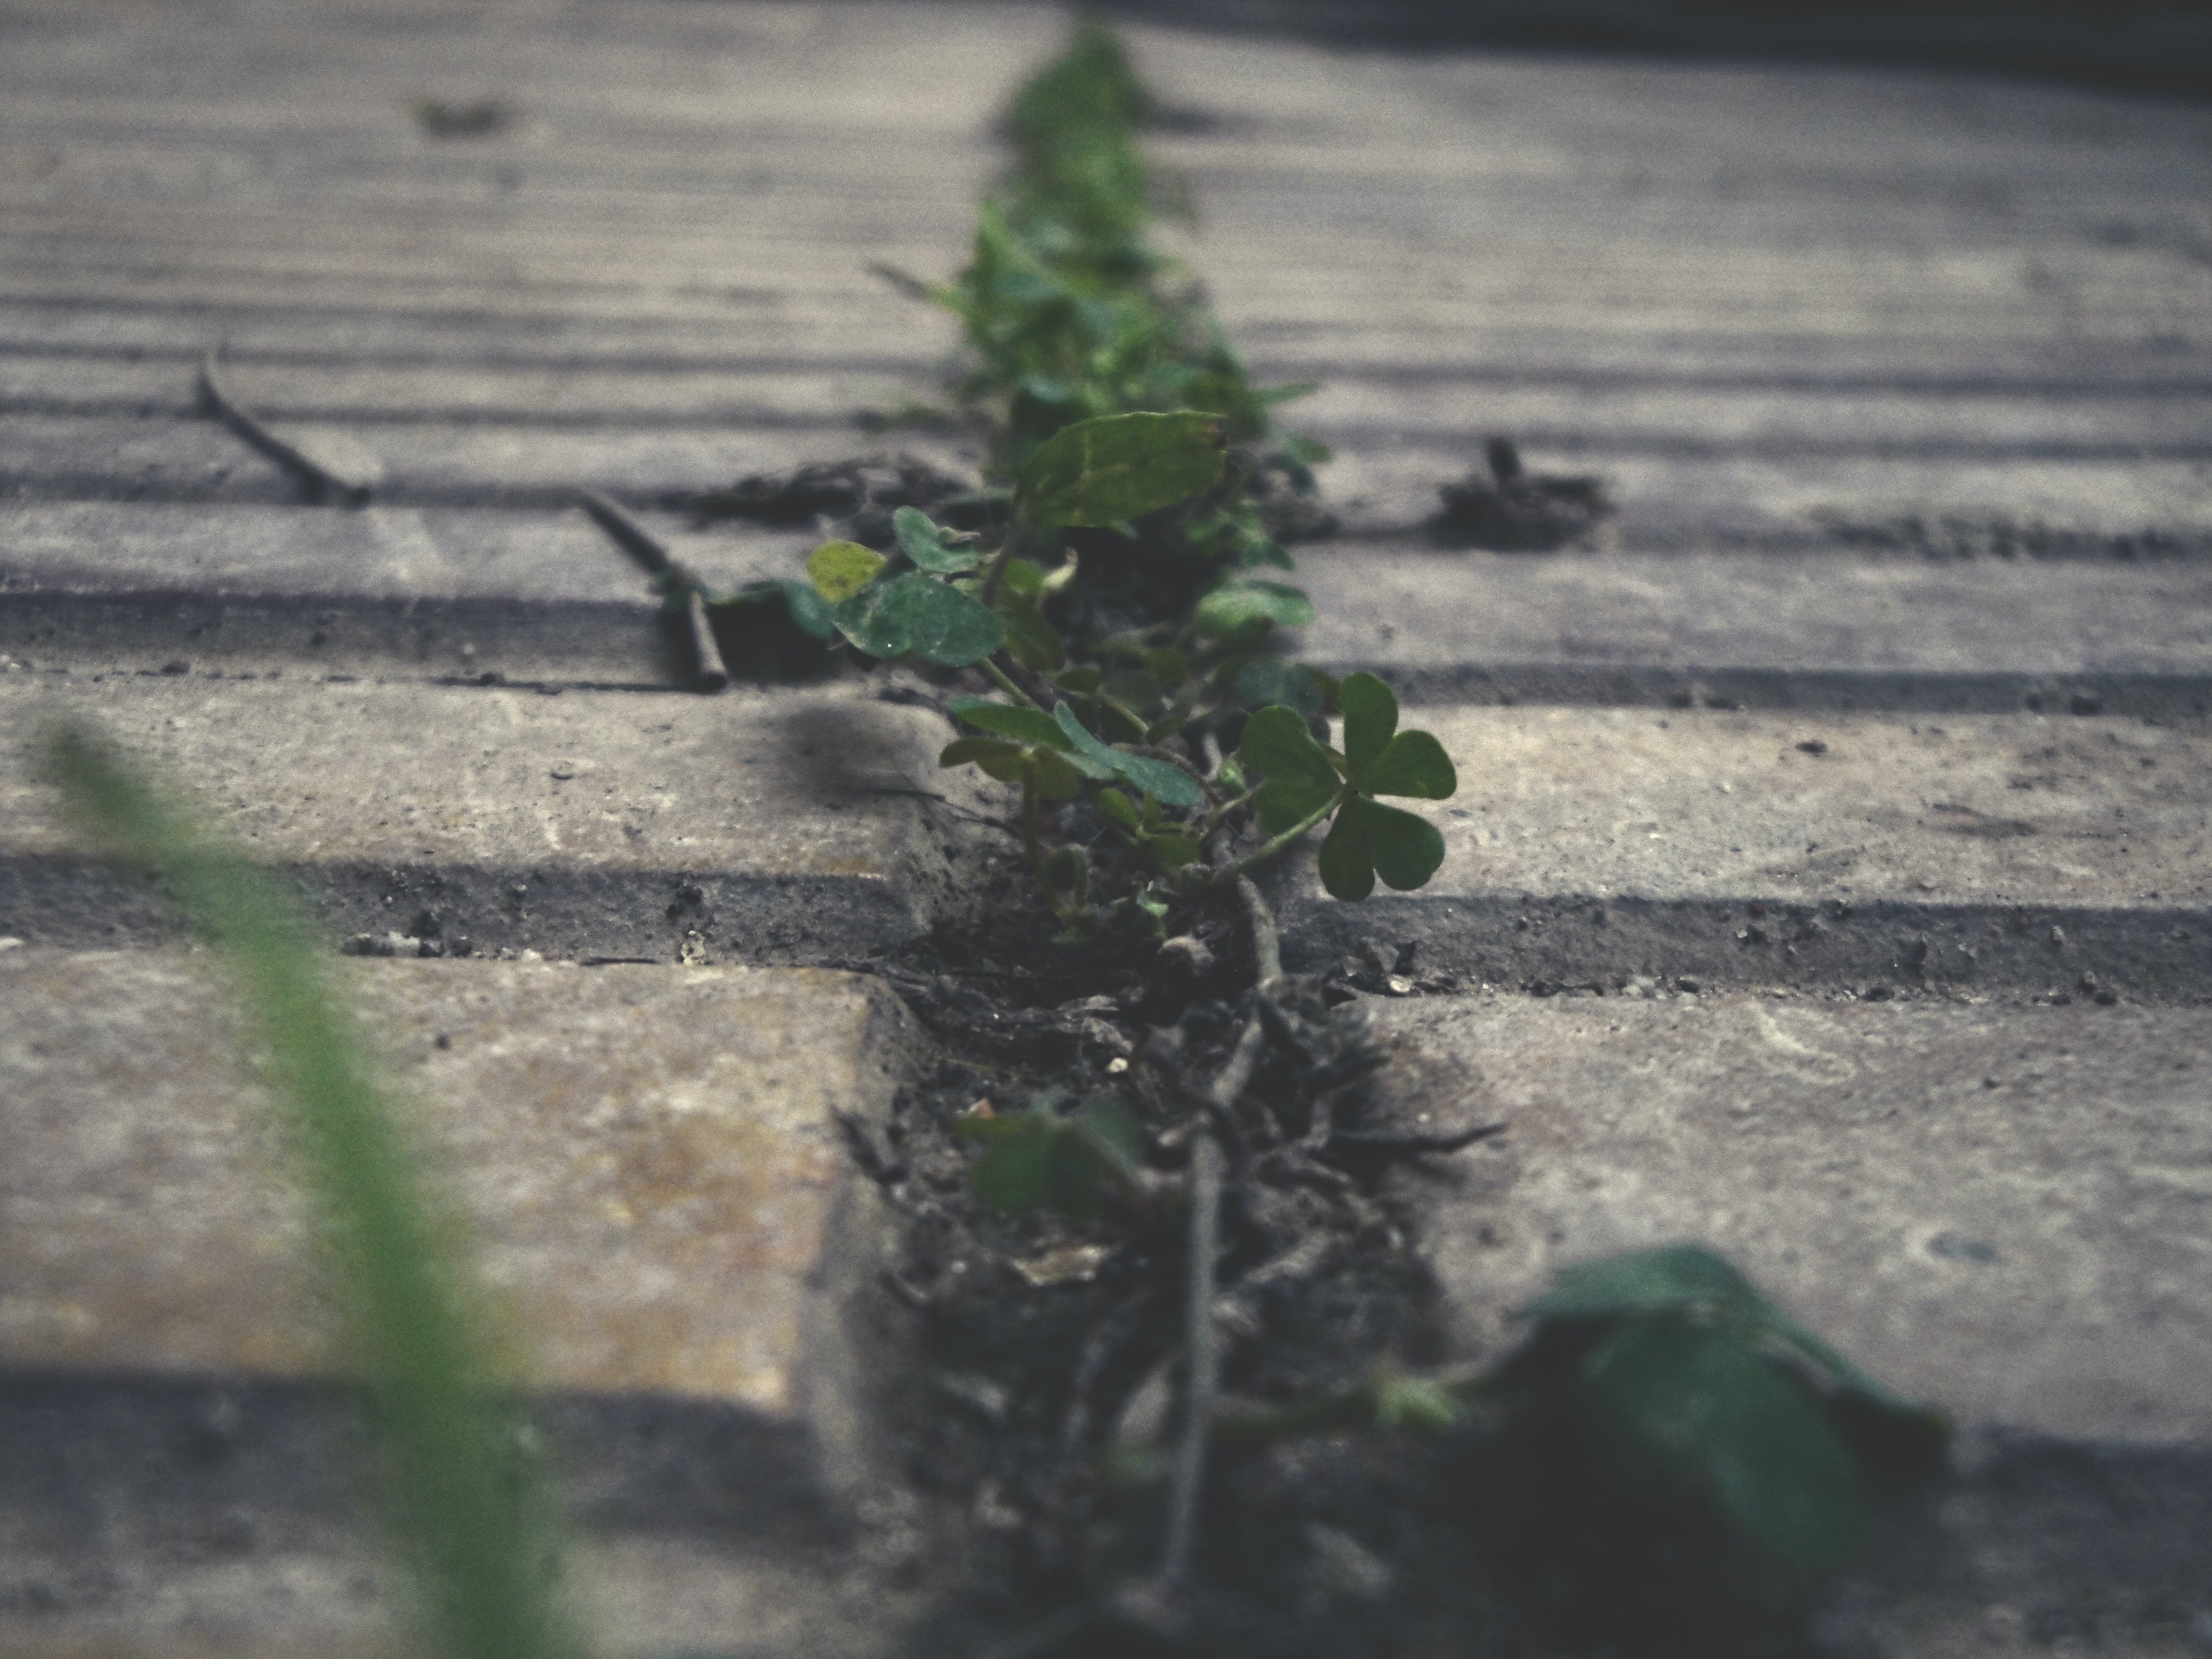 Free stock photo of alive, dry, foliage, garden